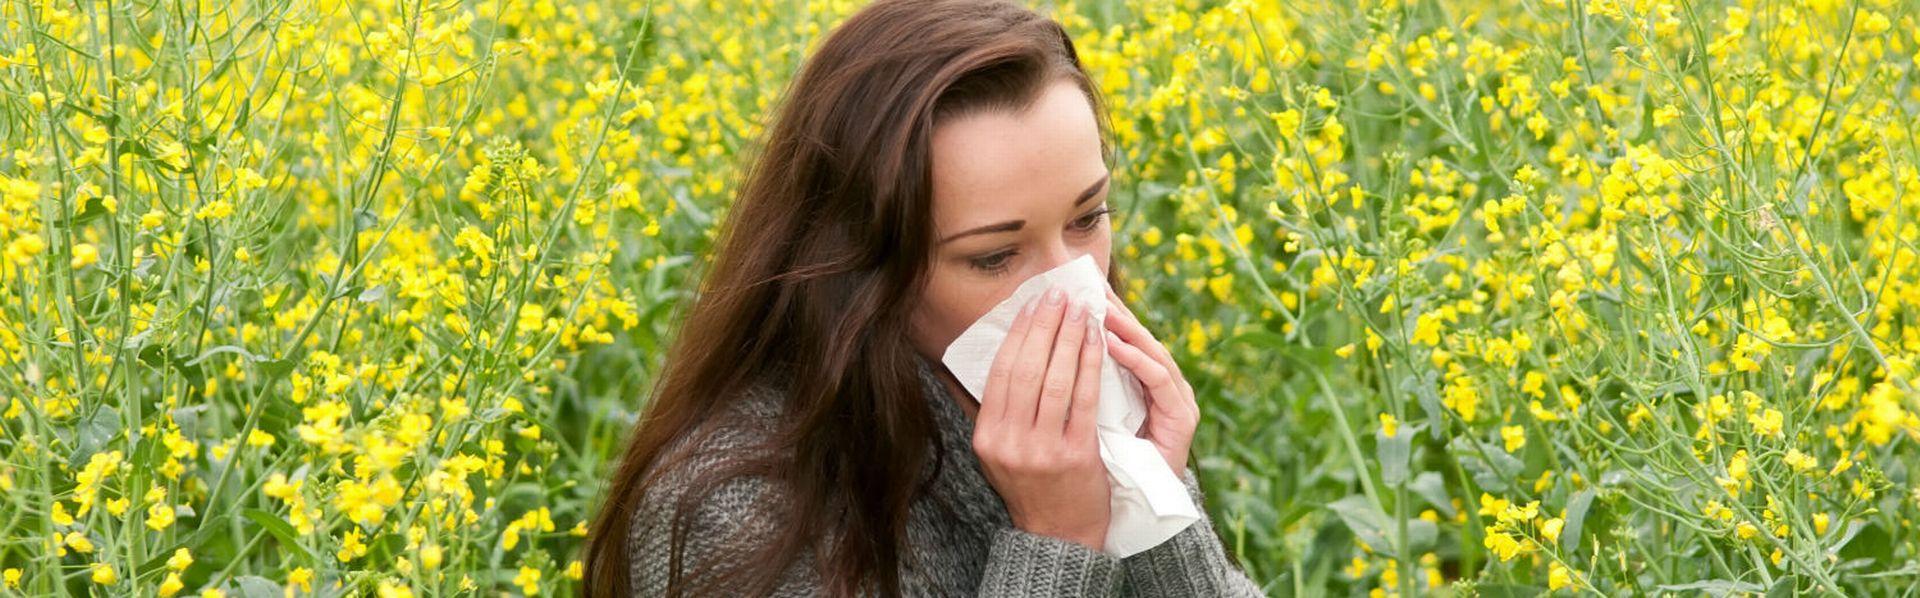 "Le dossier ""allergies"" de RTSdécouverte. luna Fotolia [© luna - Fotolia]"